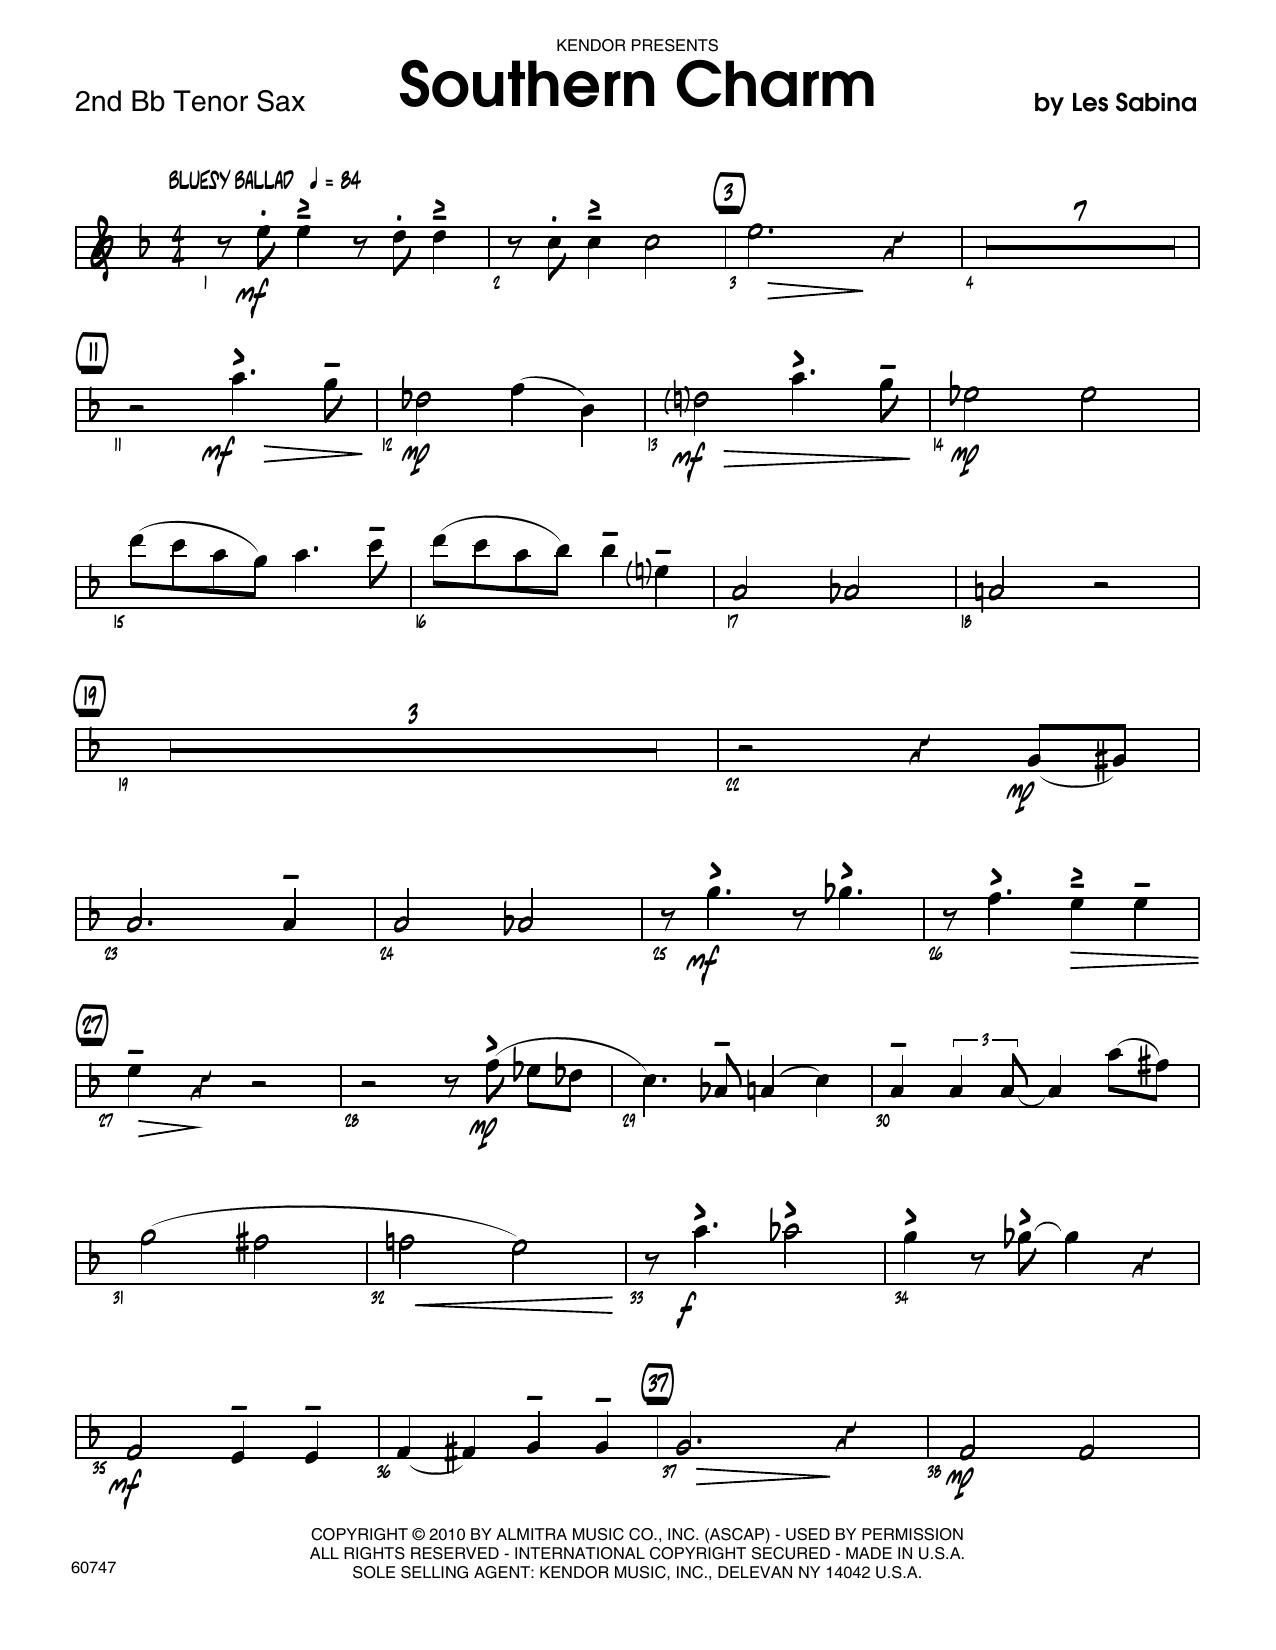 Southern Charm - 2nd Bb Tenor Saxophone Sheet Music